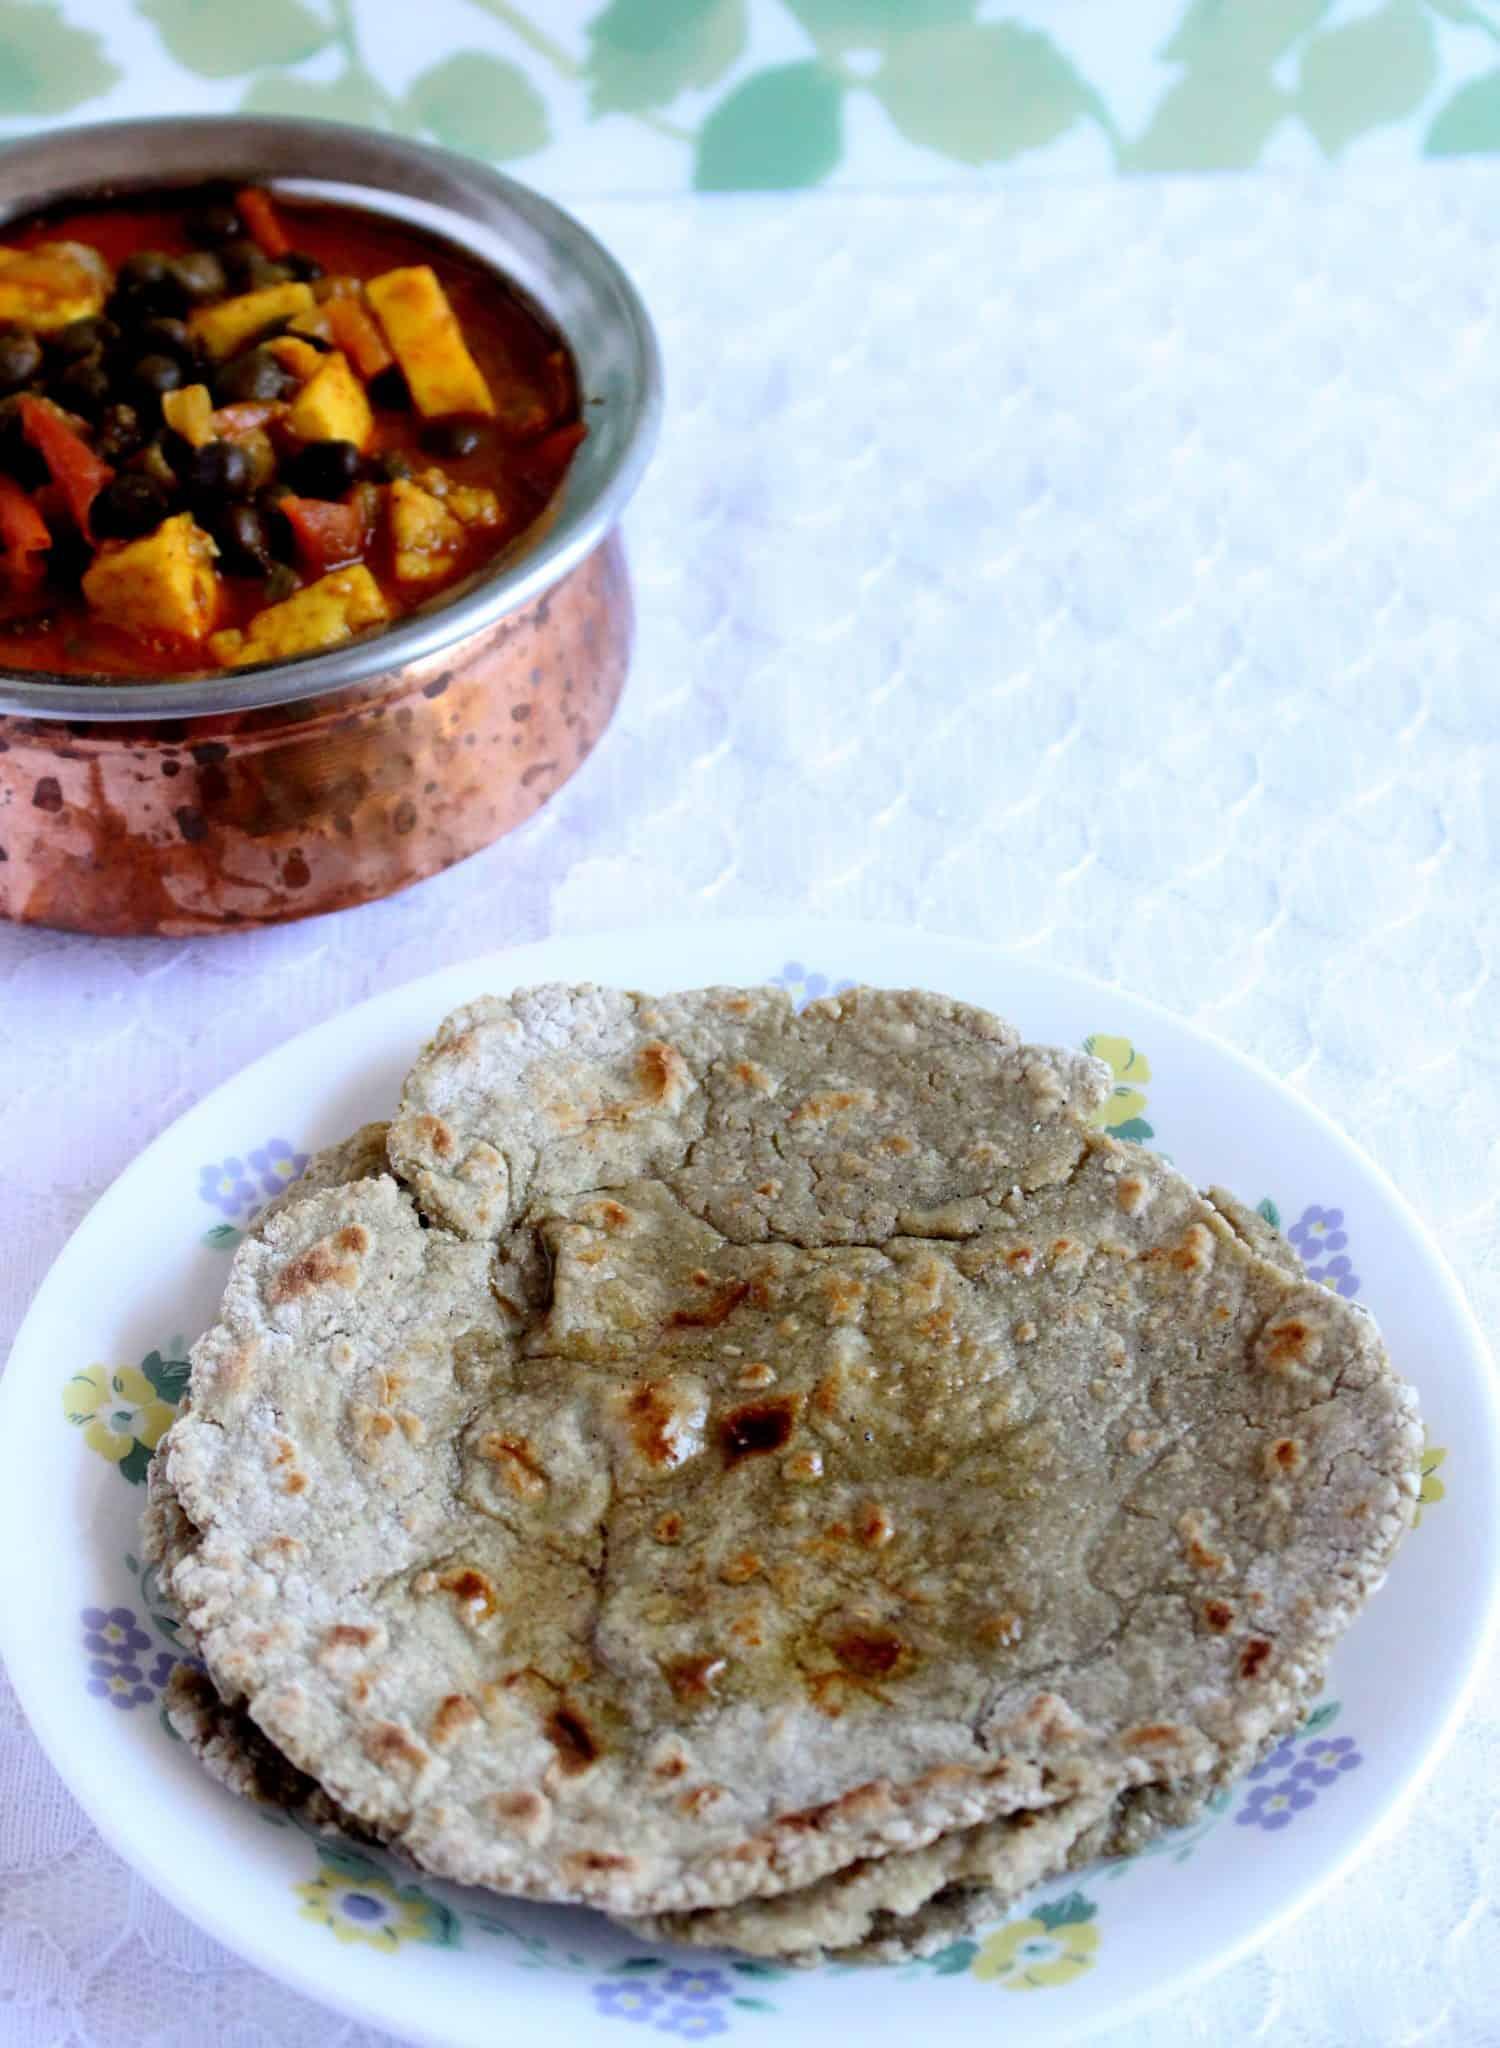 Haryana Bajra Roti – Gluten Free Millet Flatbread